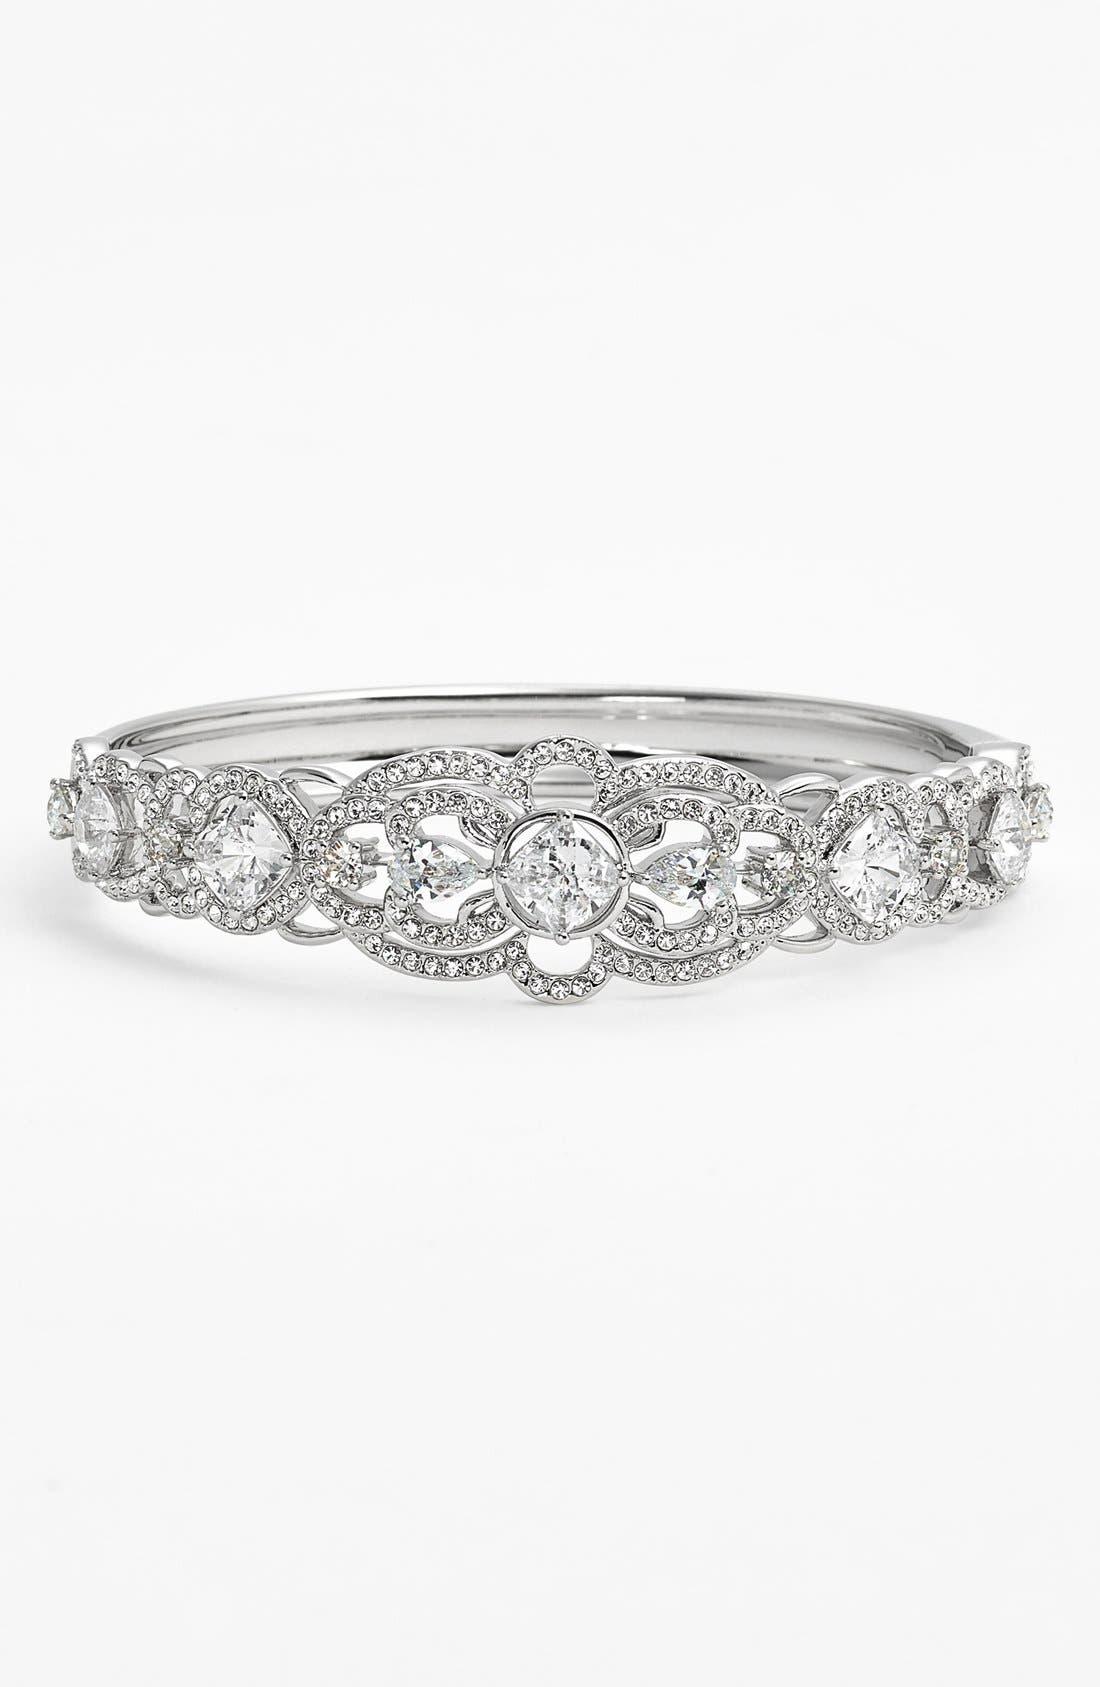 Main Image - Nadri Pavé Cubic Zirconia Bracelet